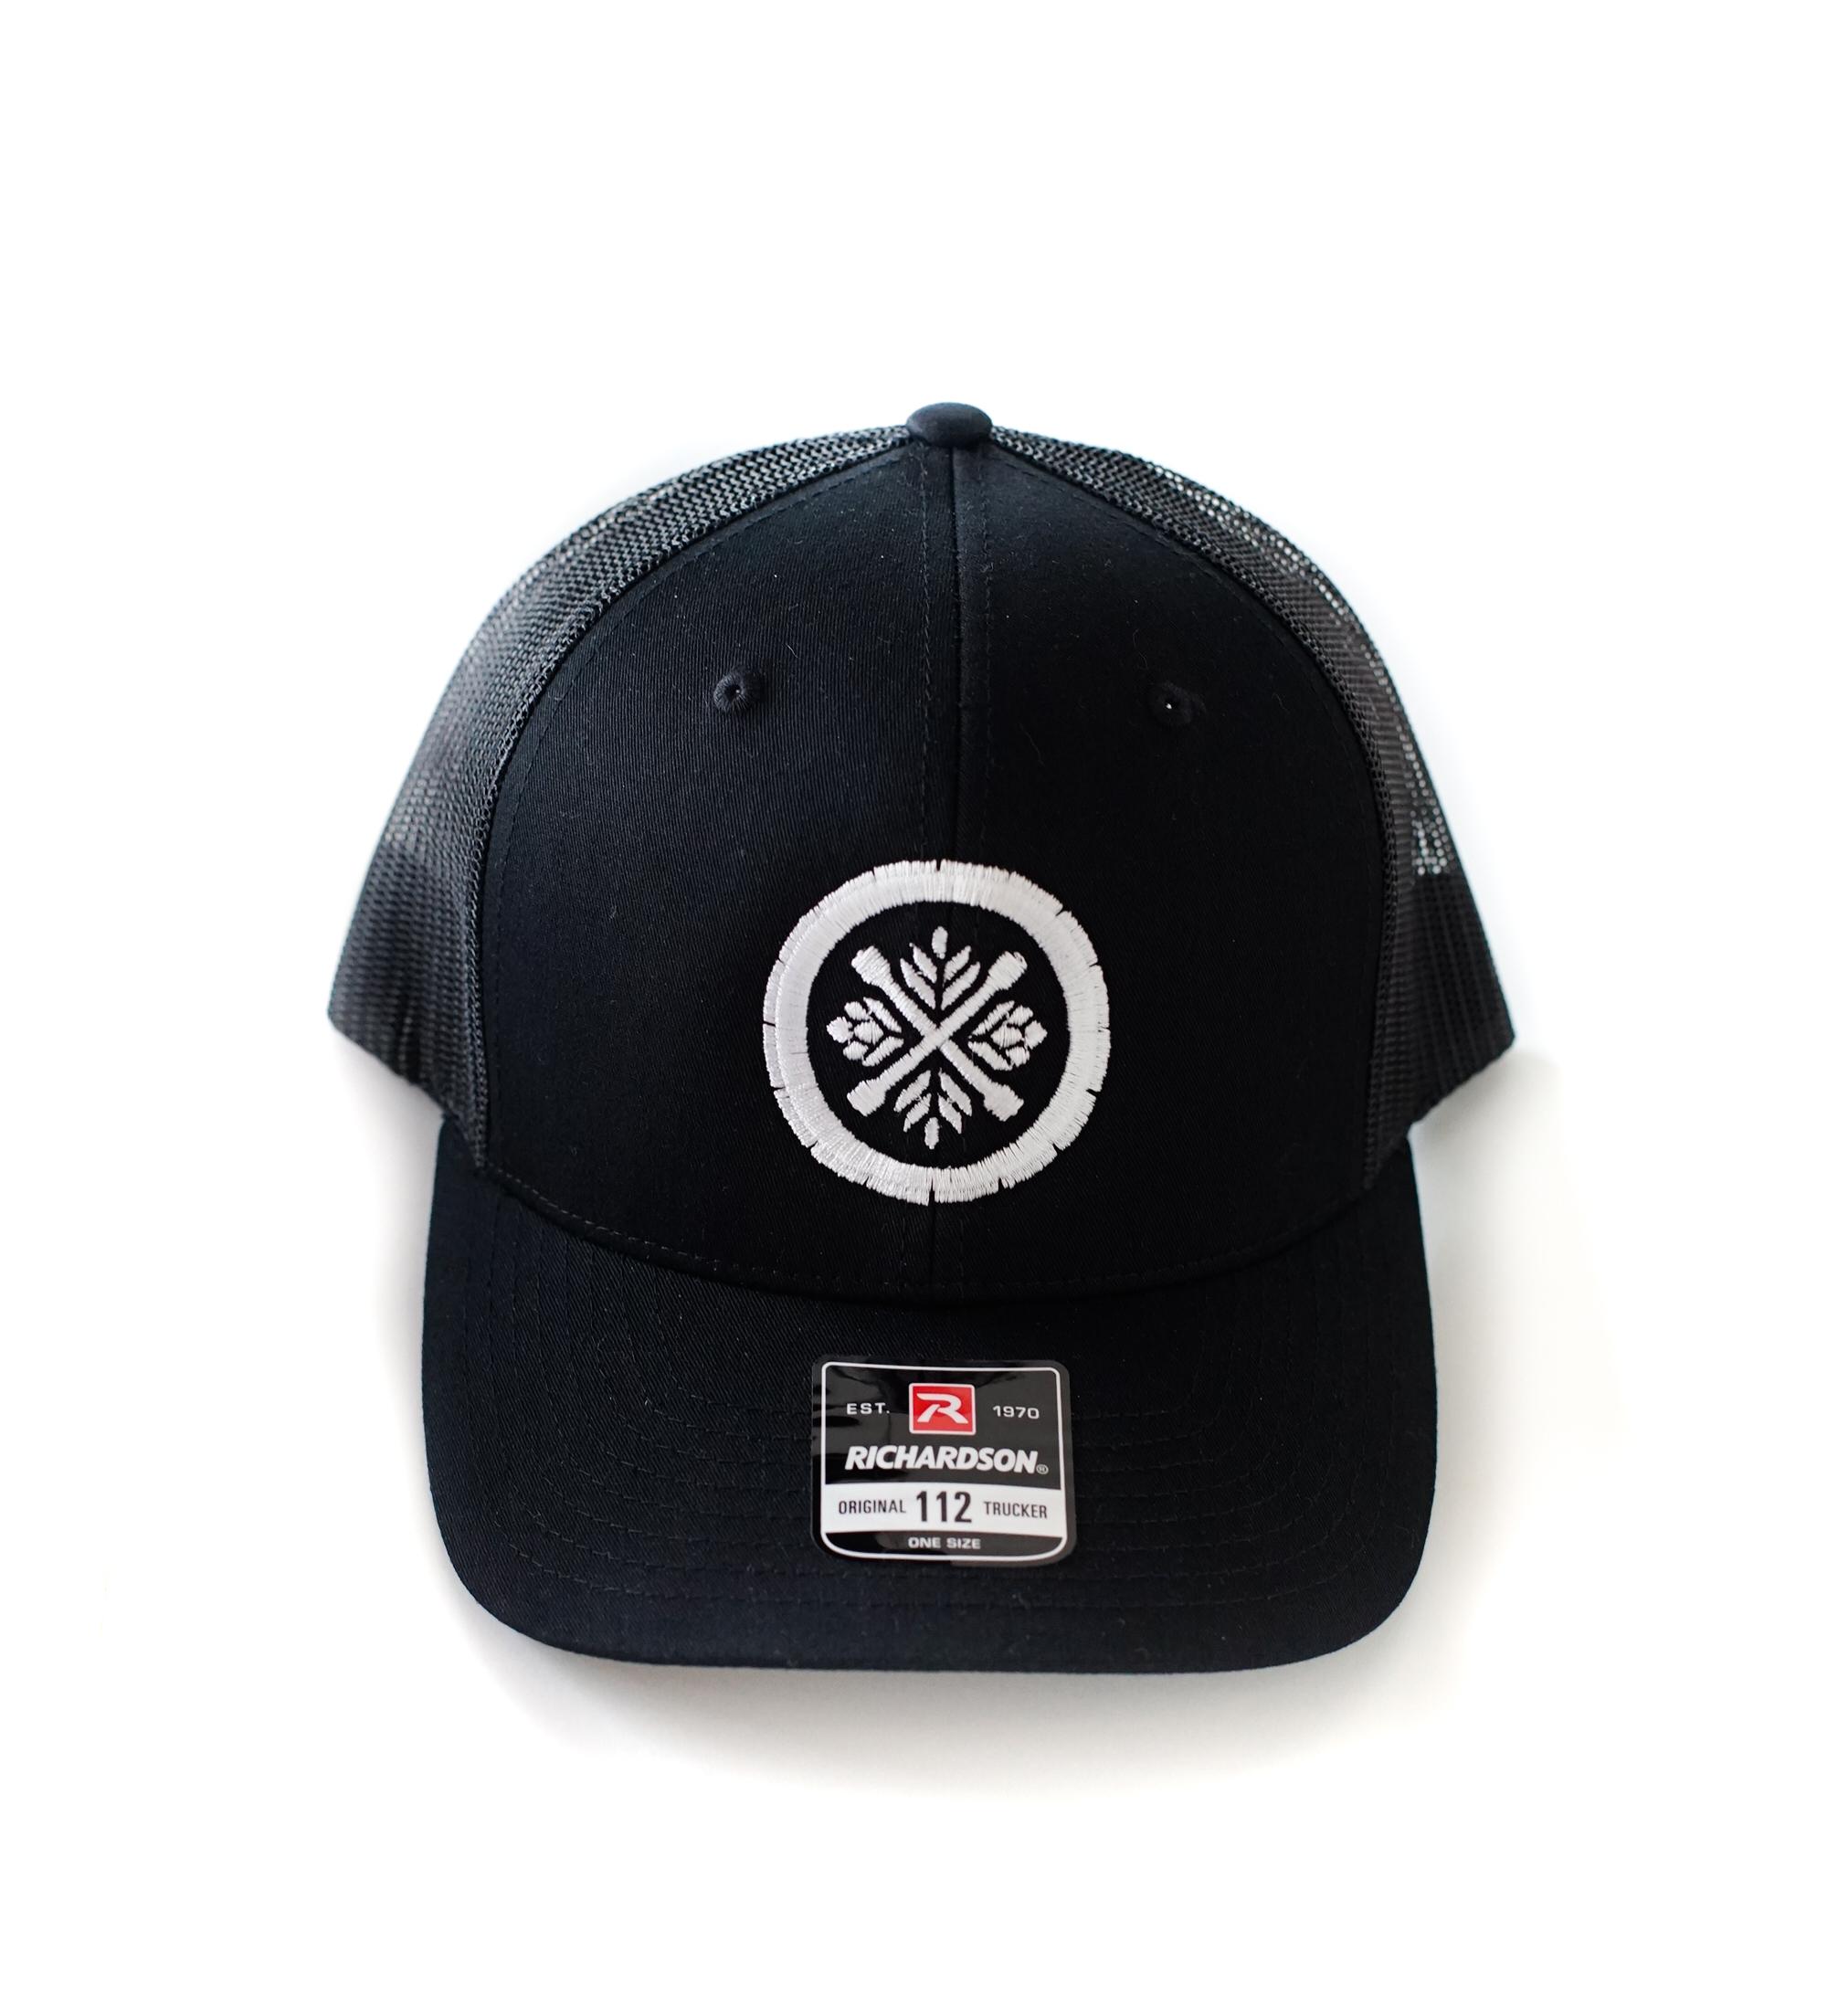 Unisex Ball Cap